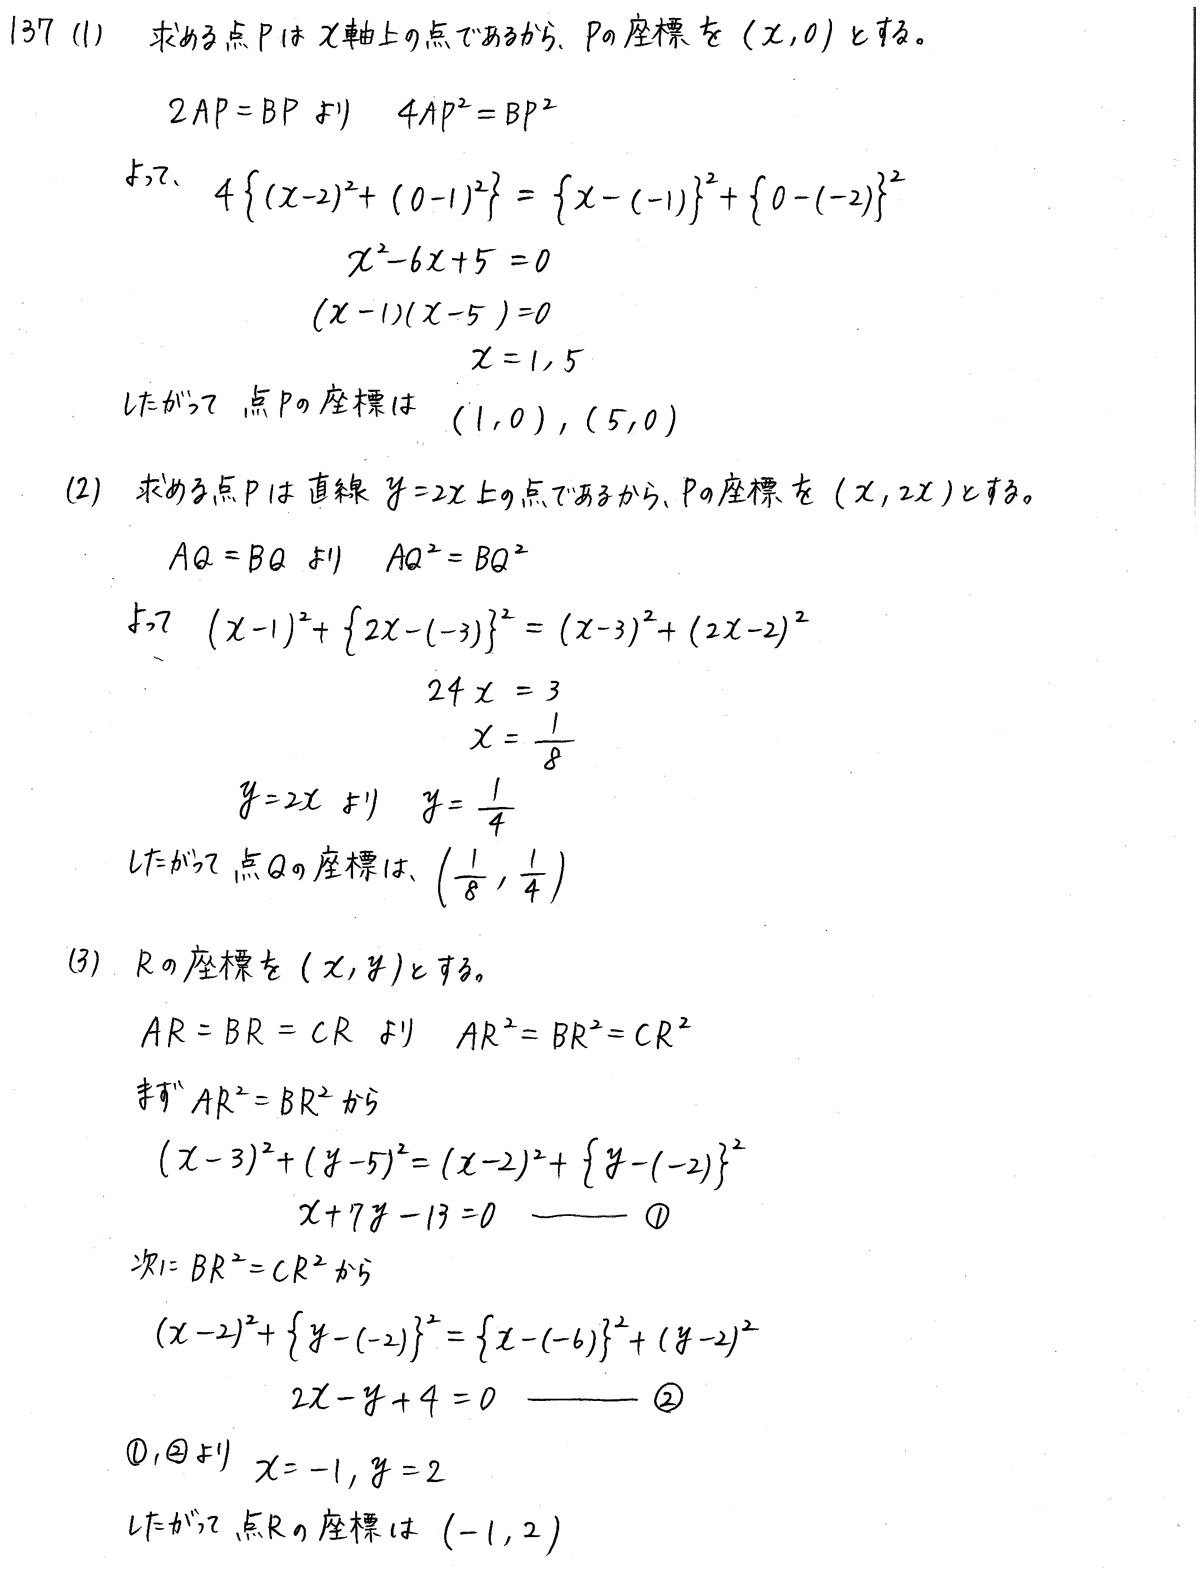 3TRIAL数学2-137解答